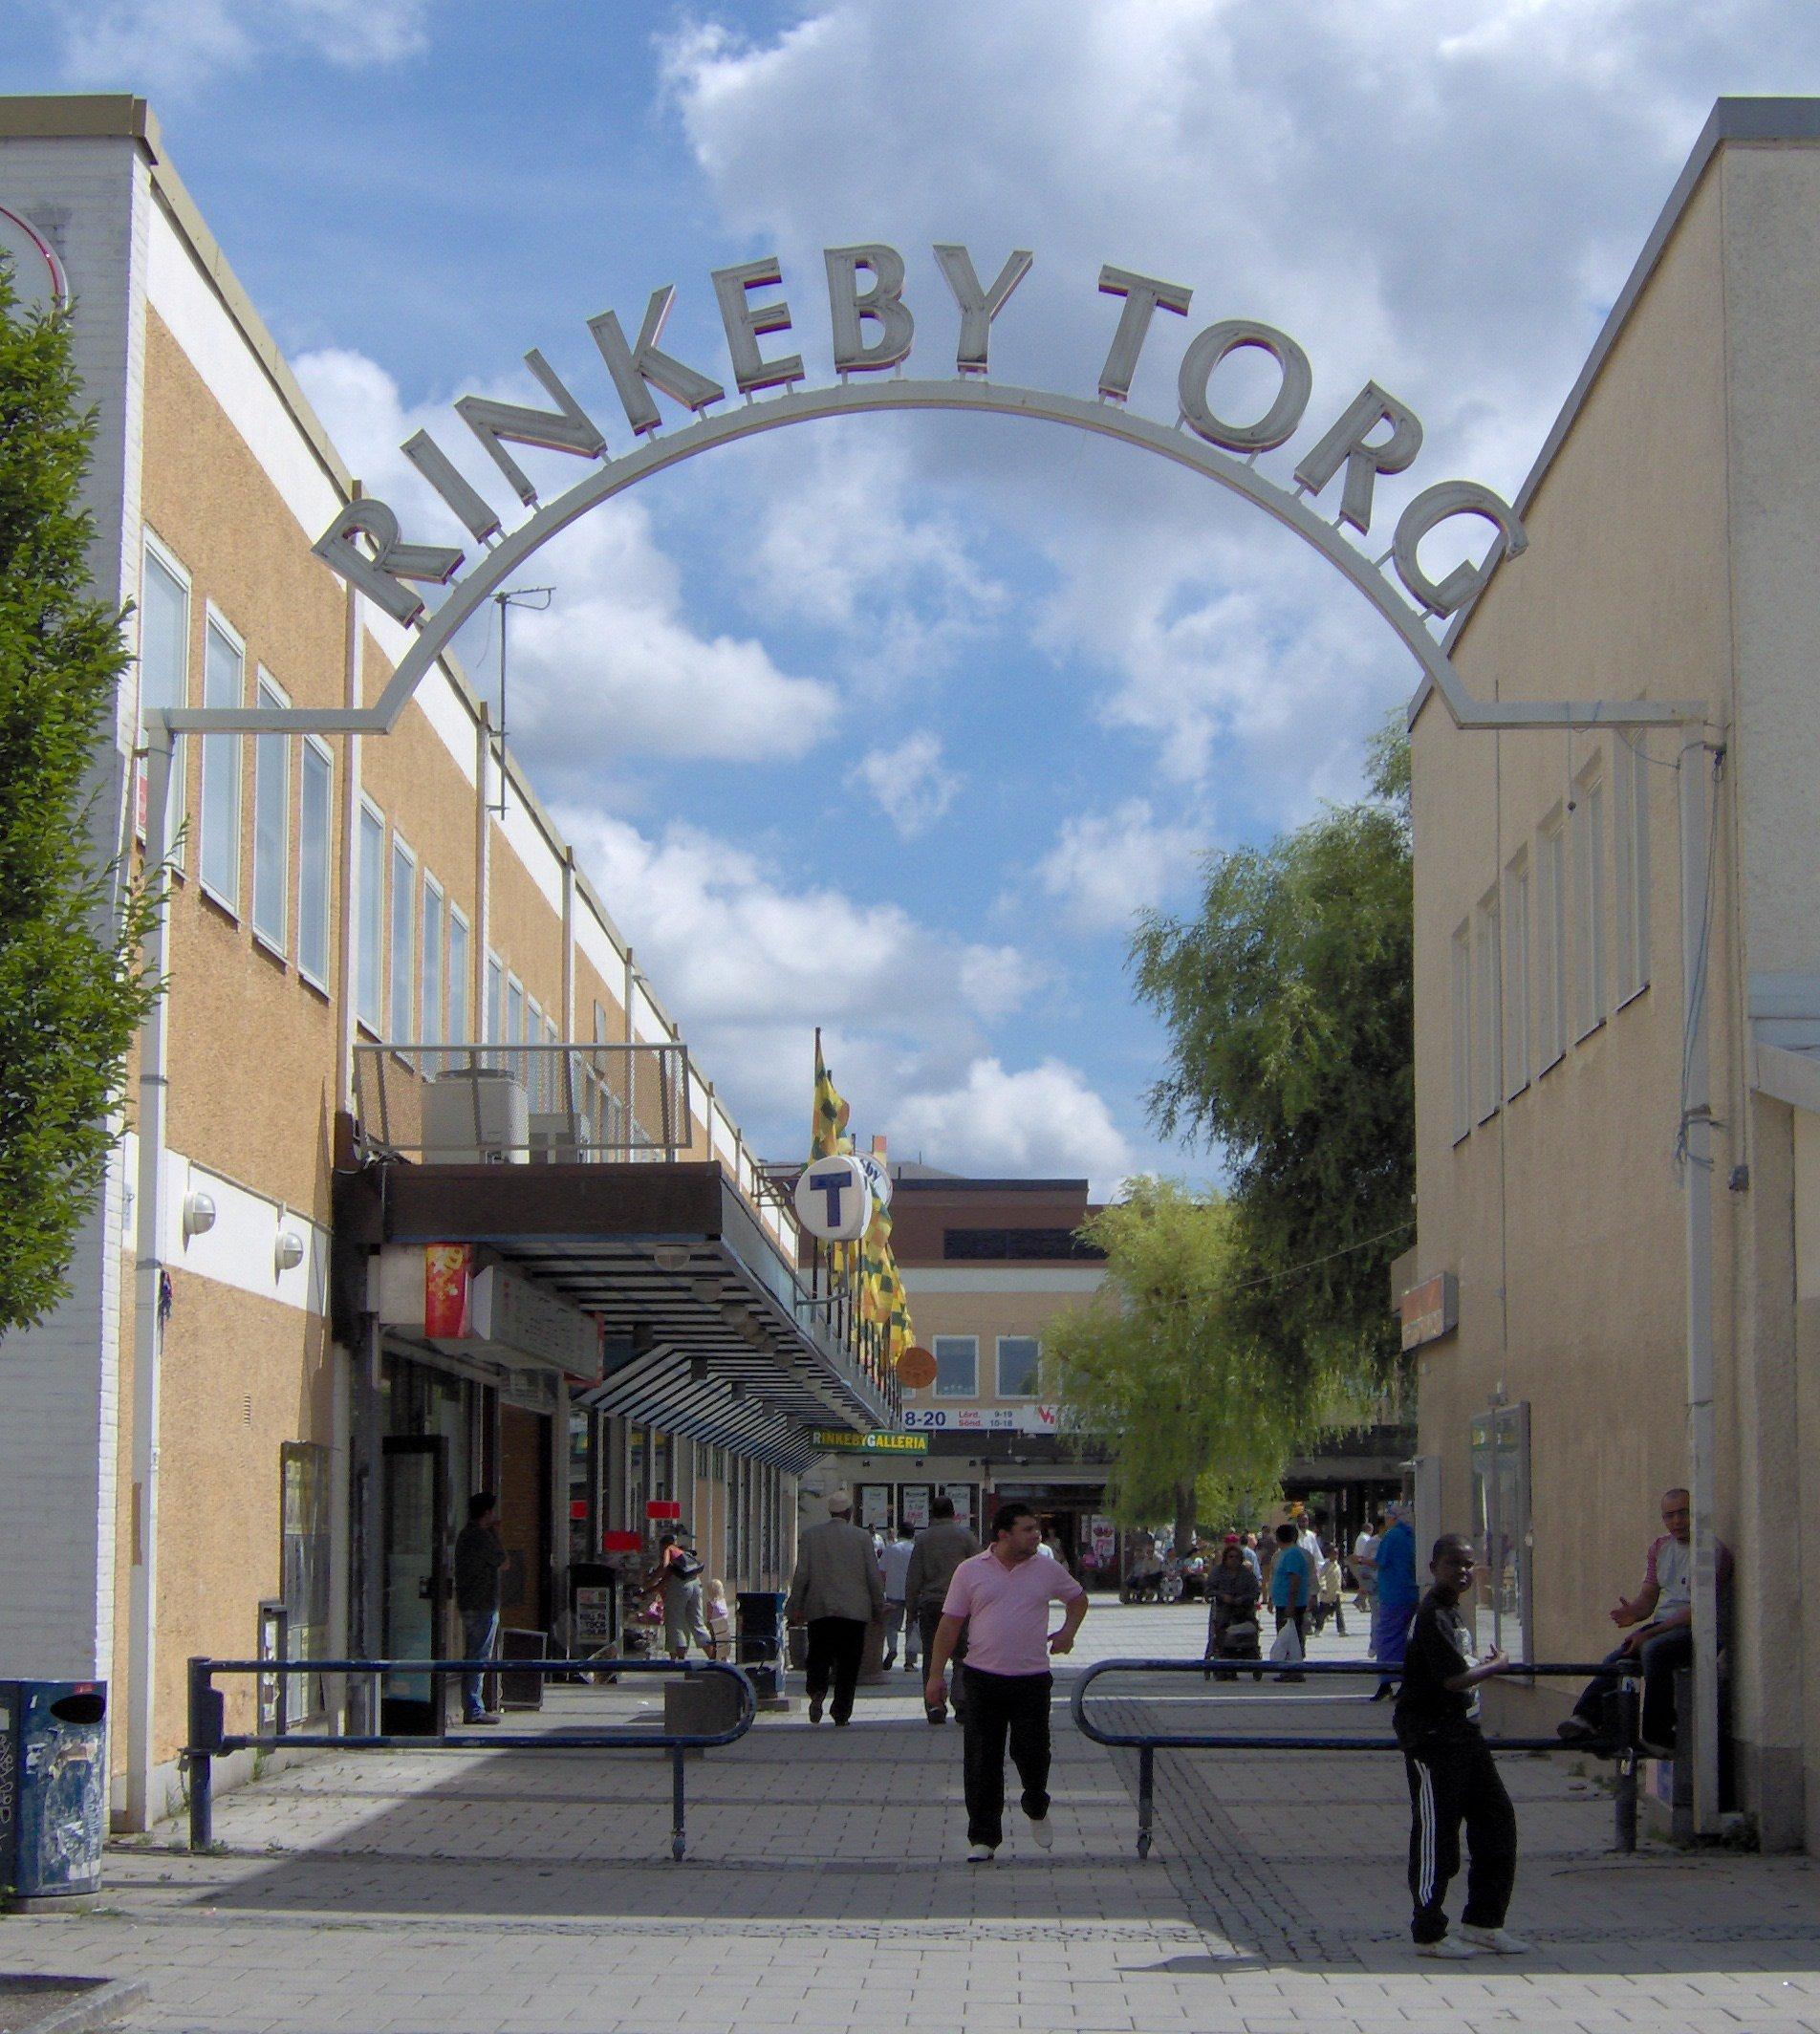 http://upload.wikimedia.org/wikipedia/commons/8/86/Rinkeby_torg.JPG